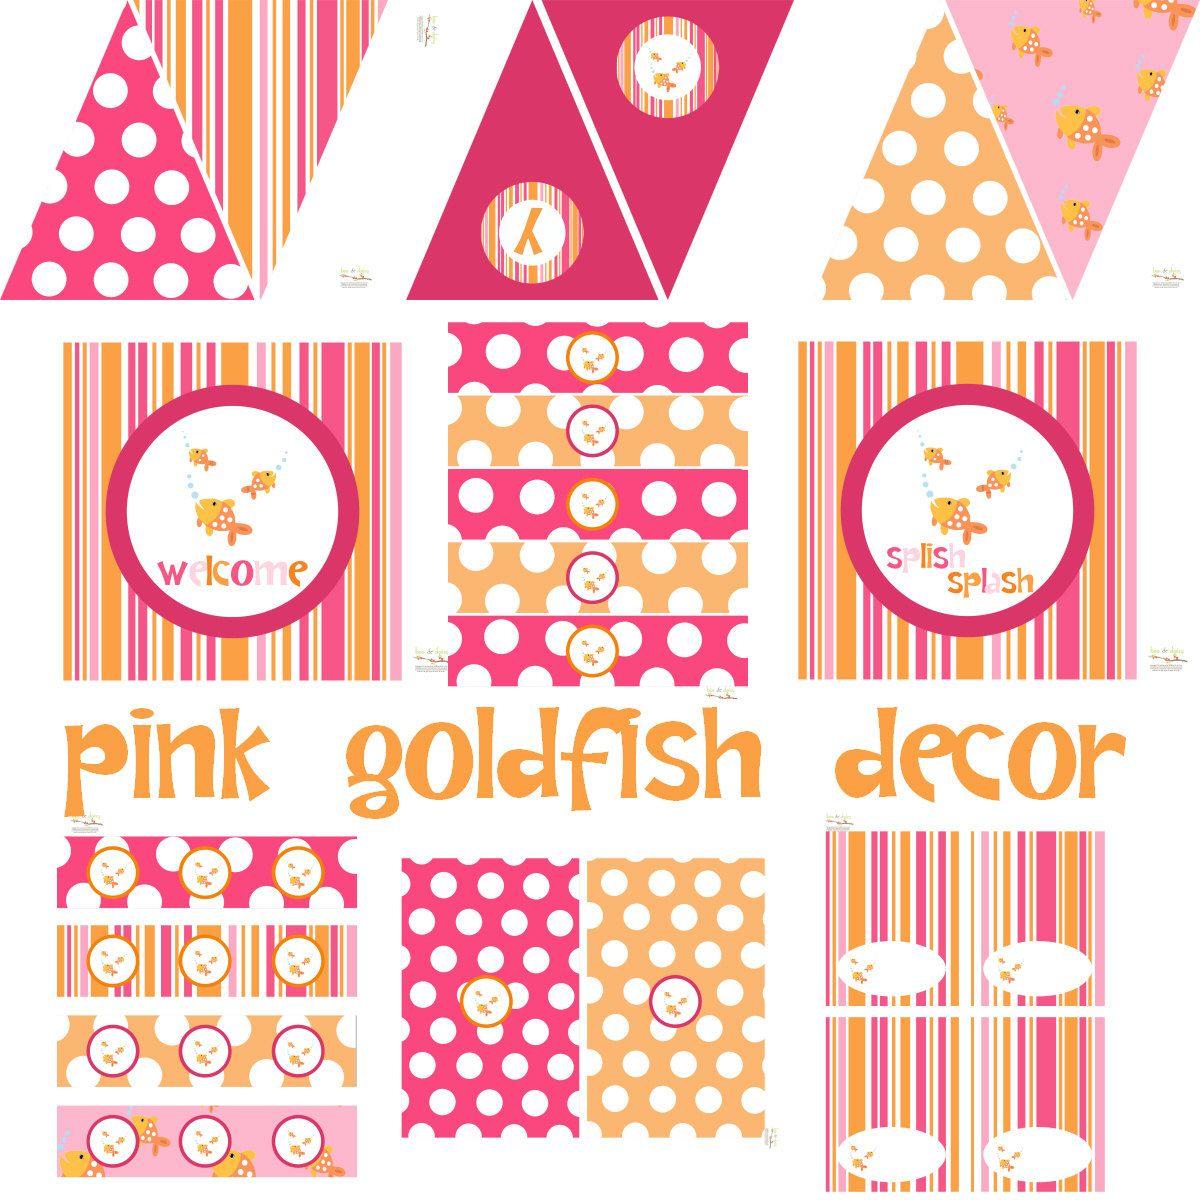 Girl Goldfish Birthday Goldfish Baby Shower Goldfish Birthday